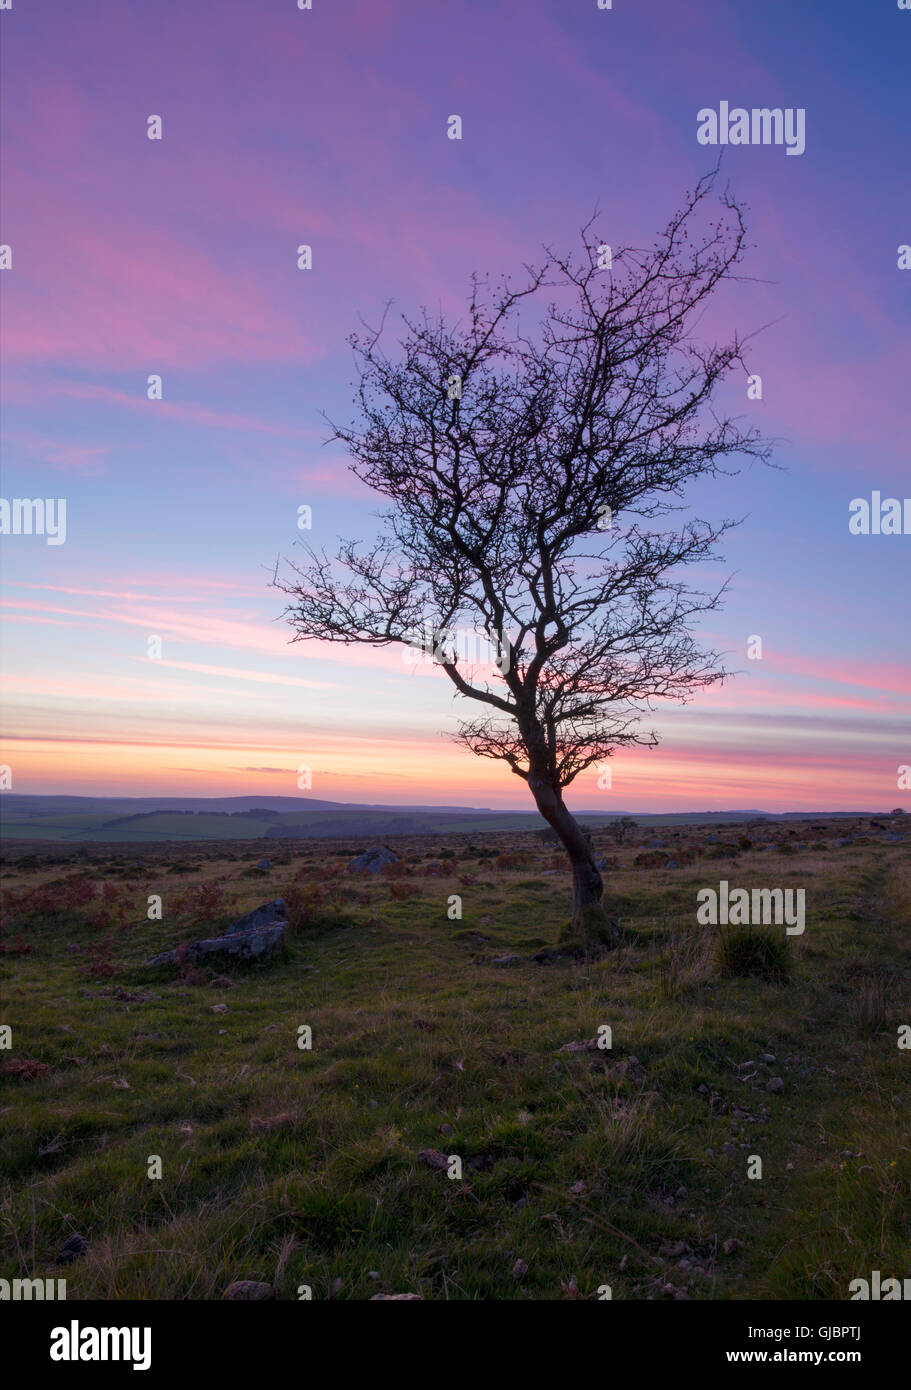 Lone tree on bodmin moor at sundown - Stock Image